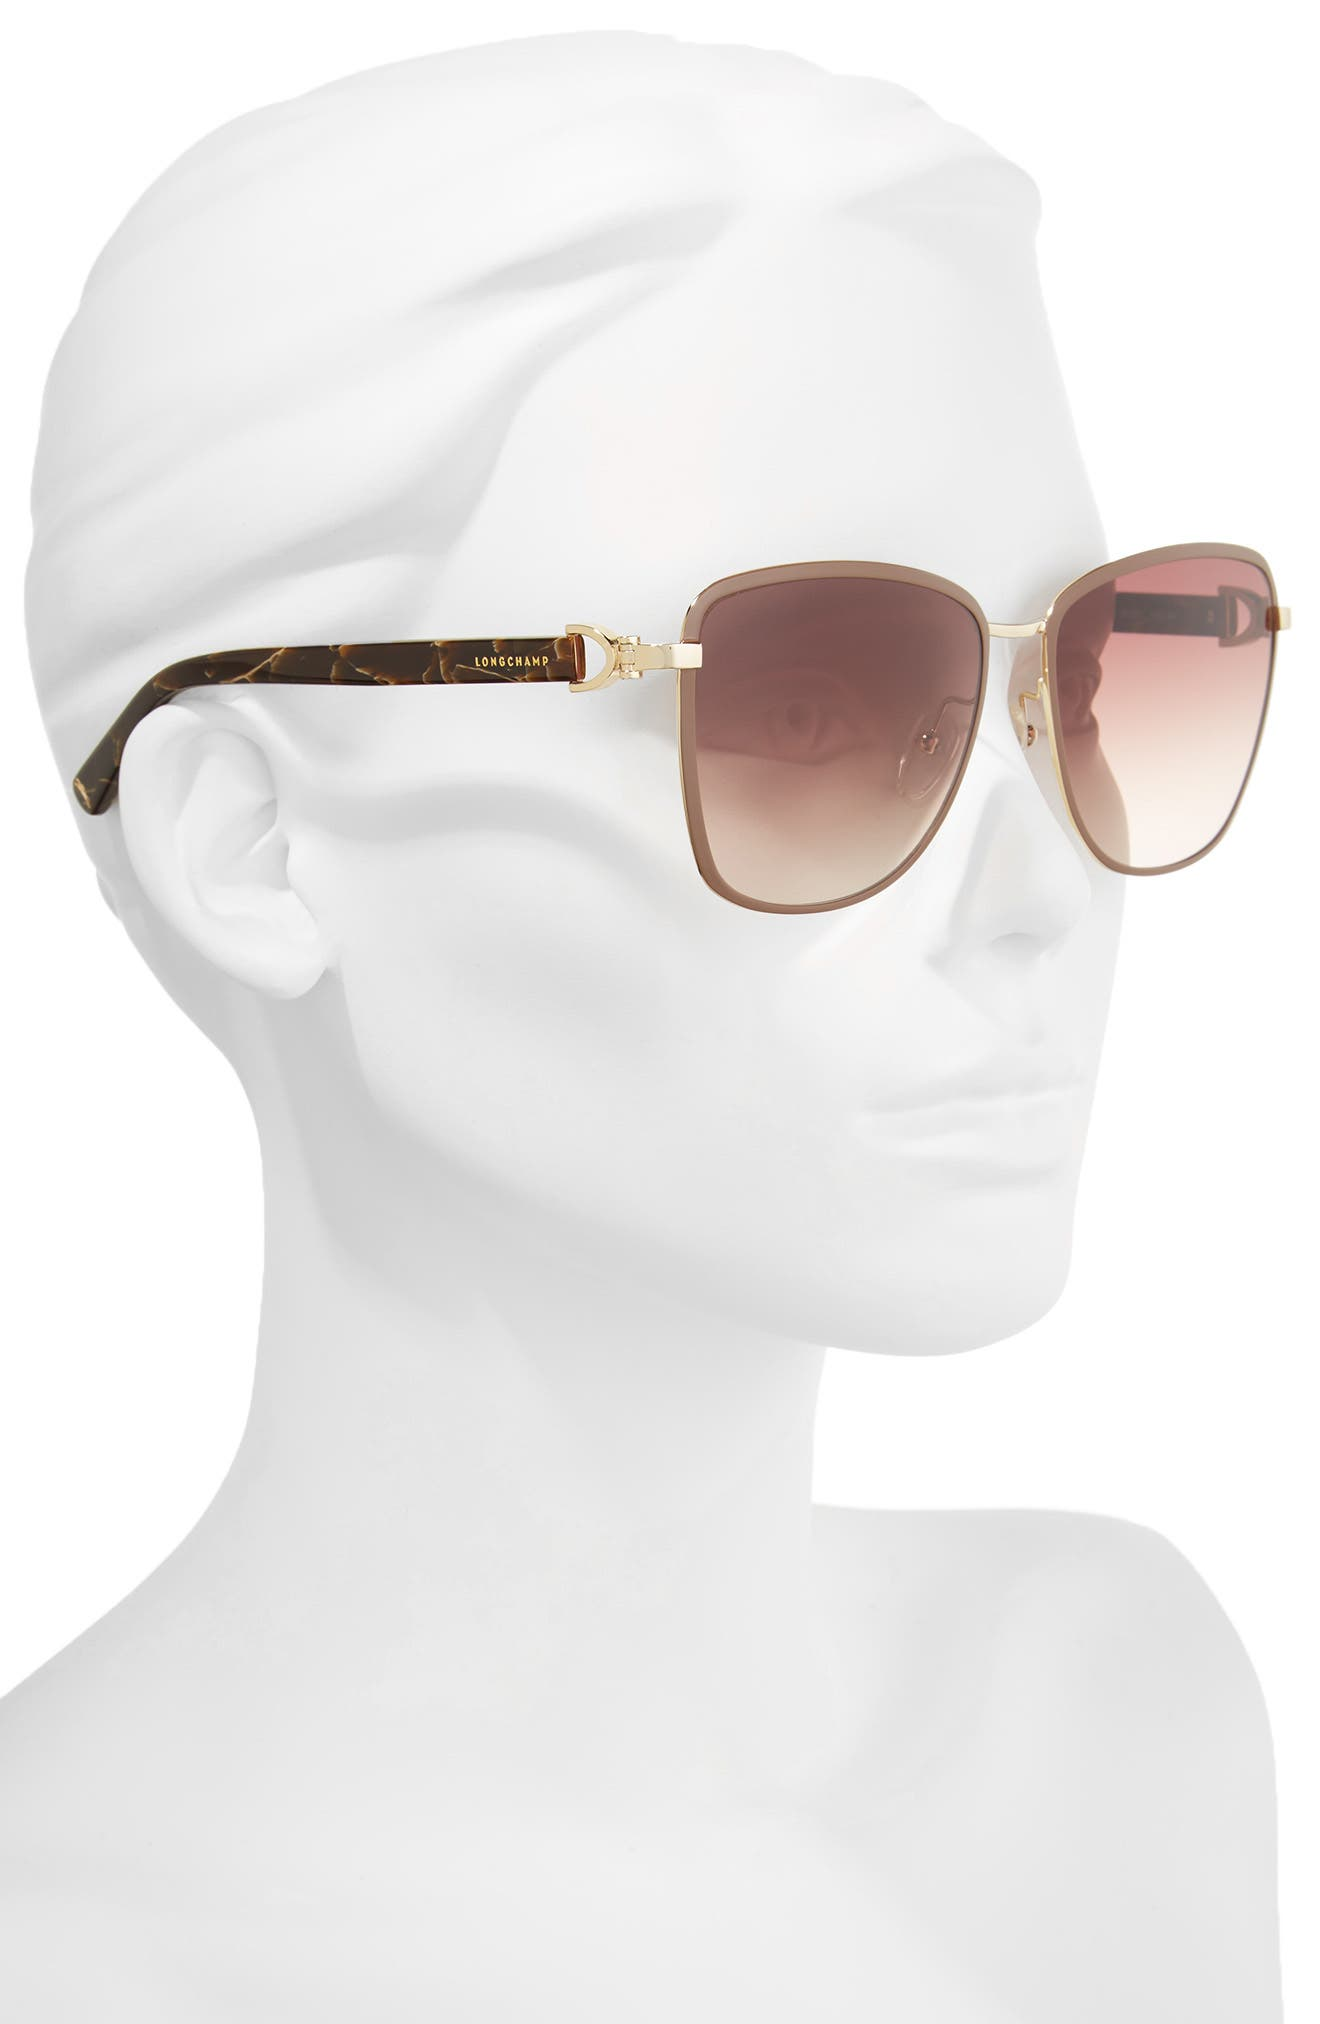 58mm Metal Sunglasses,                             Alternate thumbnail 2, color,                             Gold/ Brown